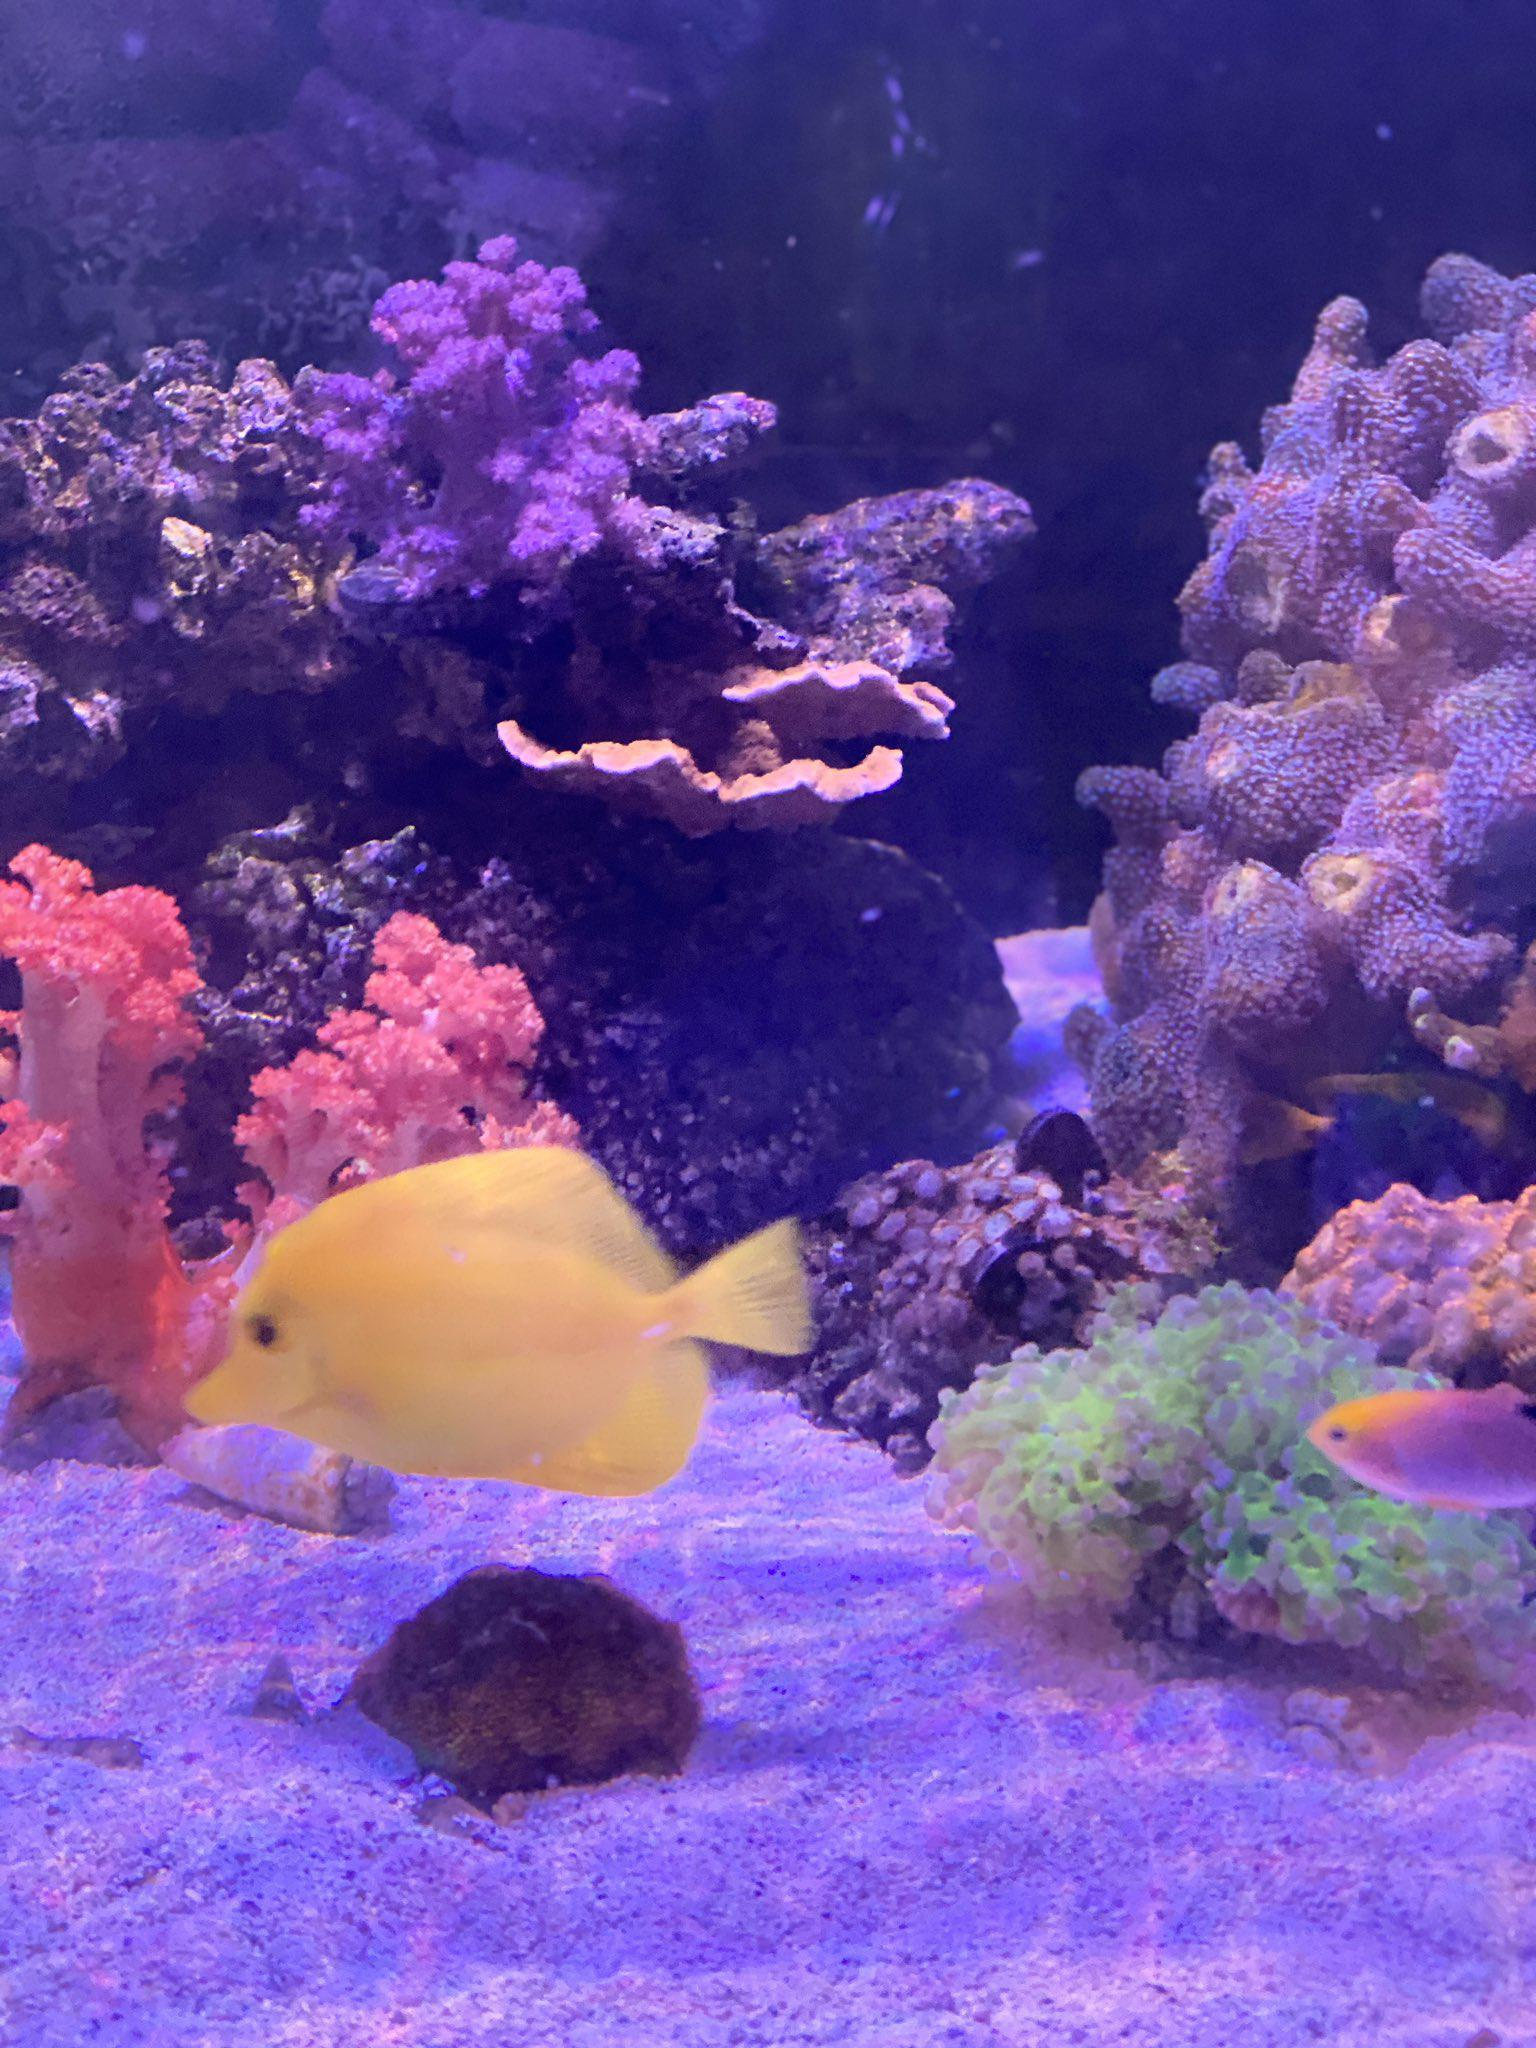 The Marine Biology Society